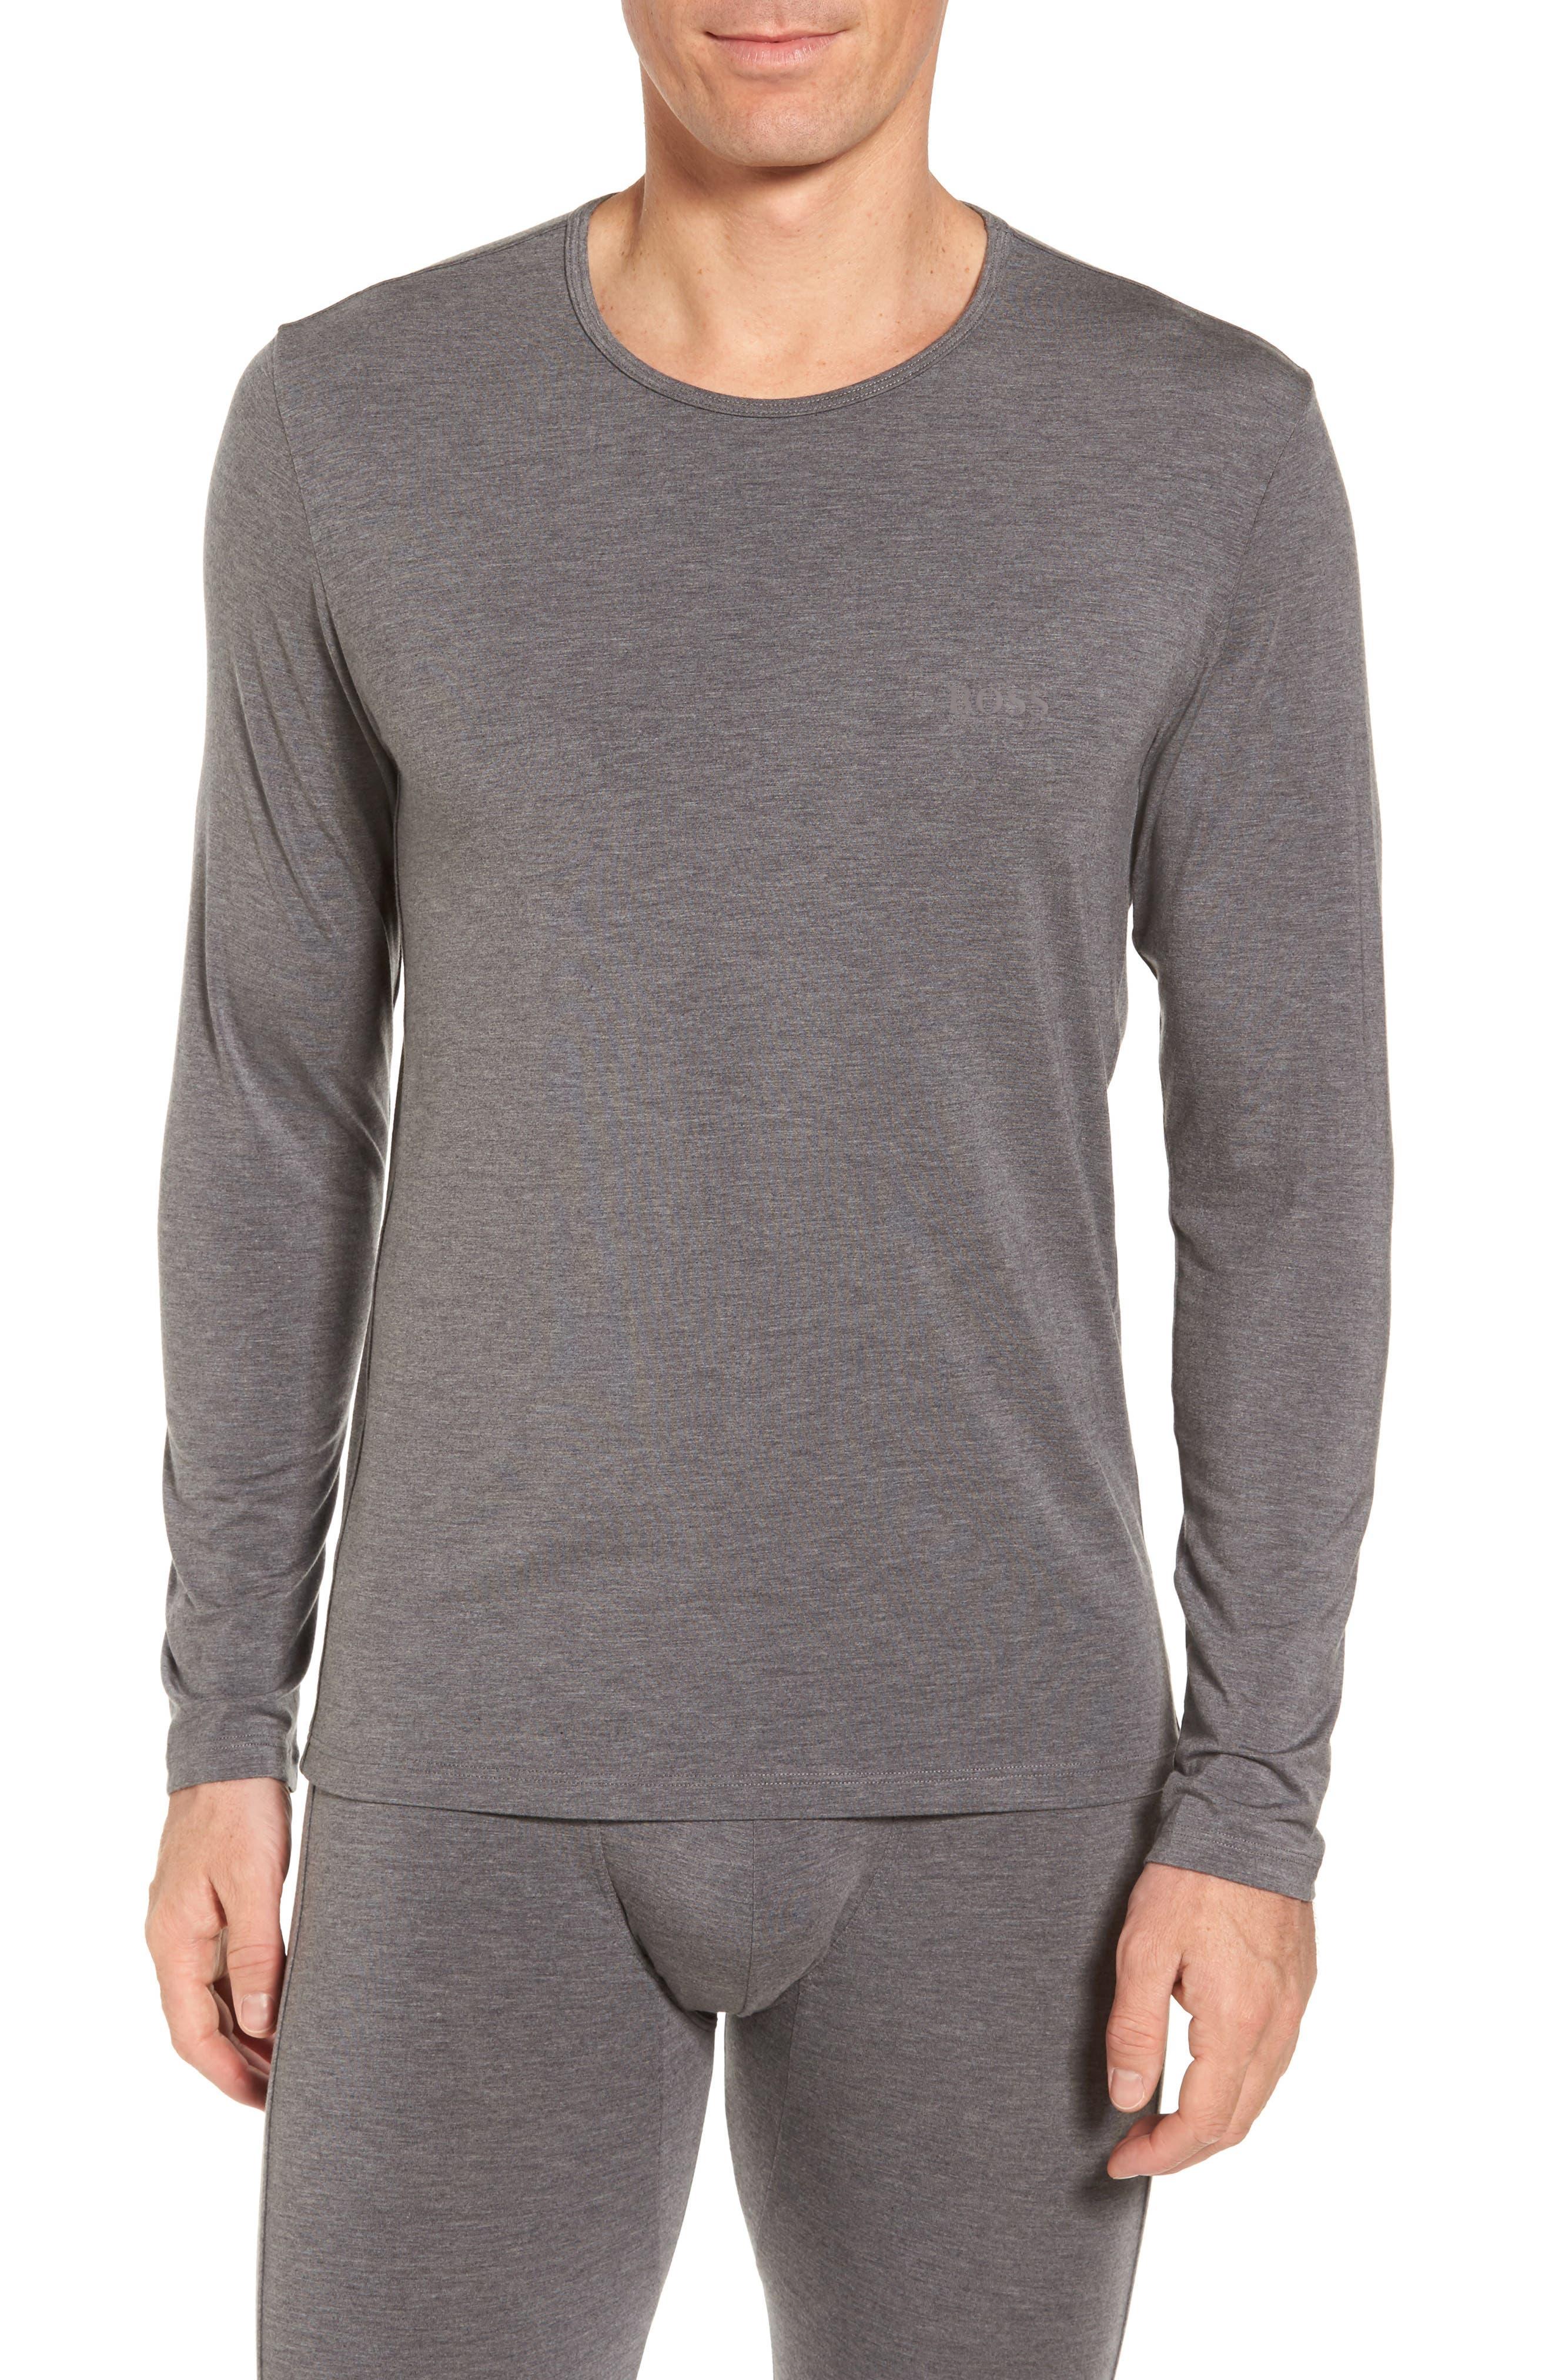 Main Image - BOSS Thermal Long Sleeve T-Shirt